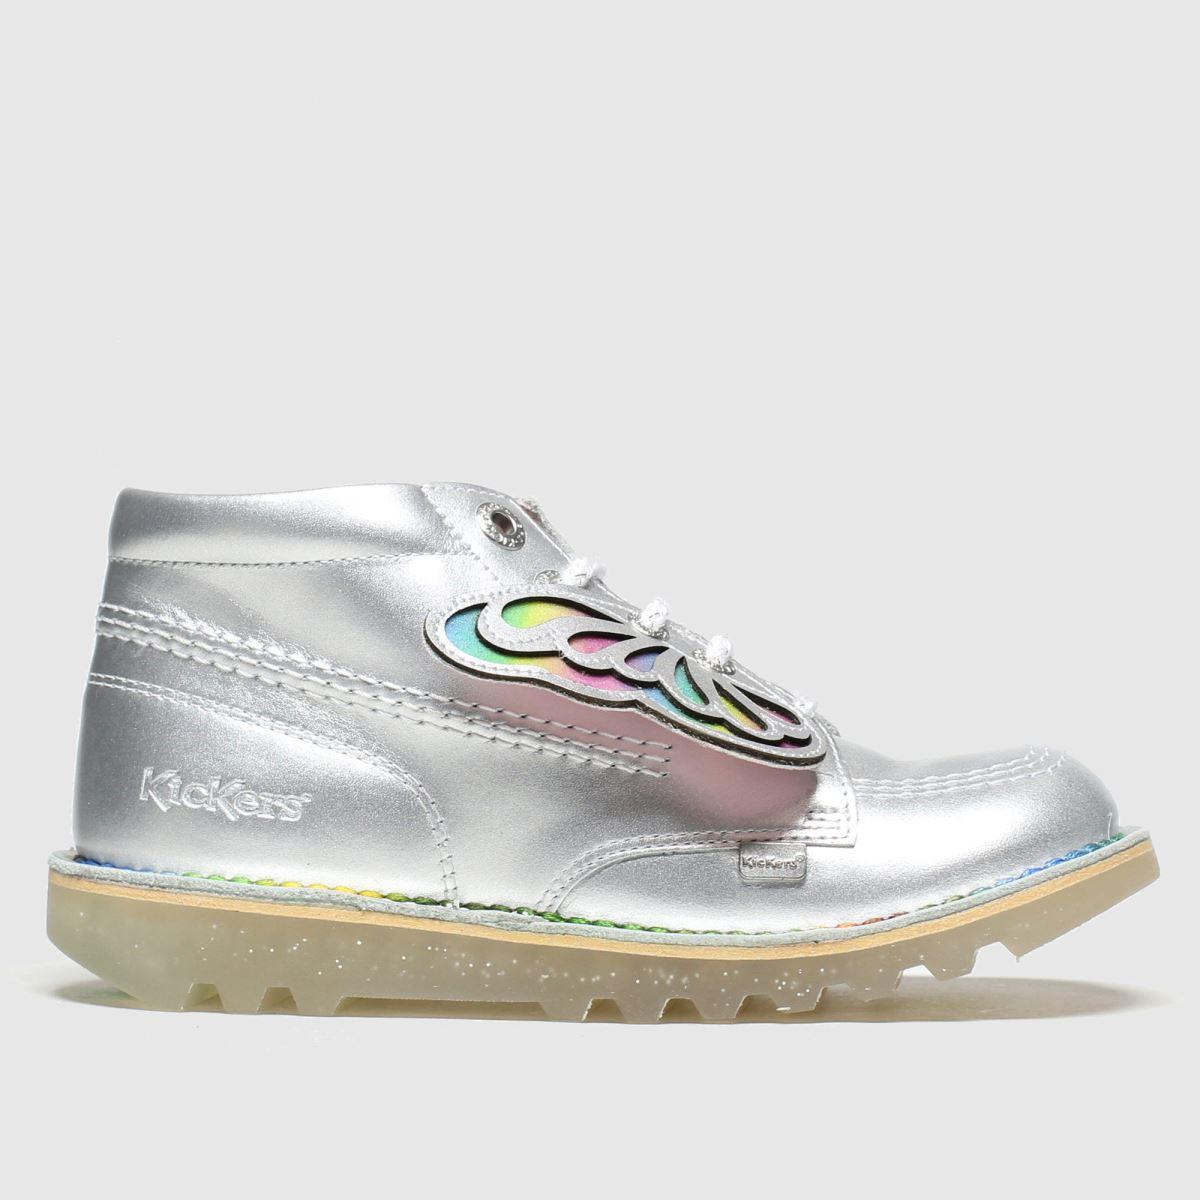 Kickers Silver Kick Hi Faeries Boots Junior